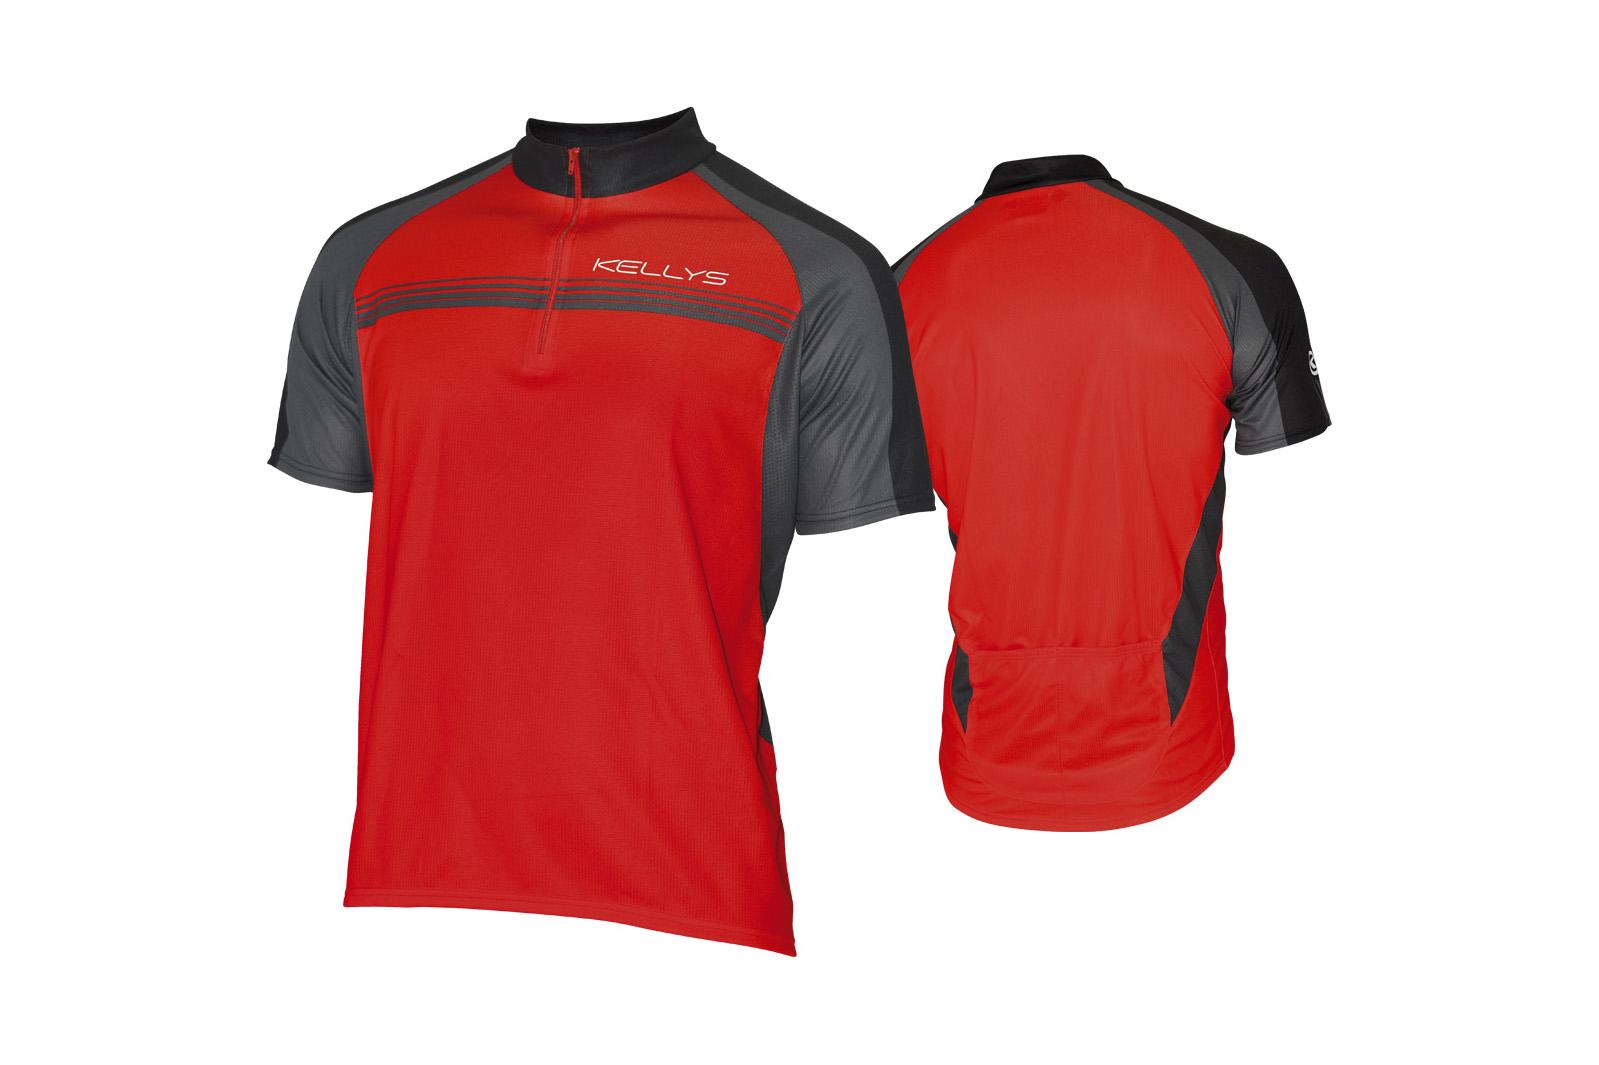 Pánský dres KELLYS PRO Sport, vel. XL, červená, krátký rukáv (Pánský cyklistický dres KELLYS, vel. XL, krátký rukáv, barva červená dle vyobrazení!)